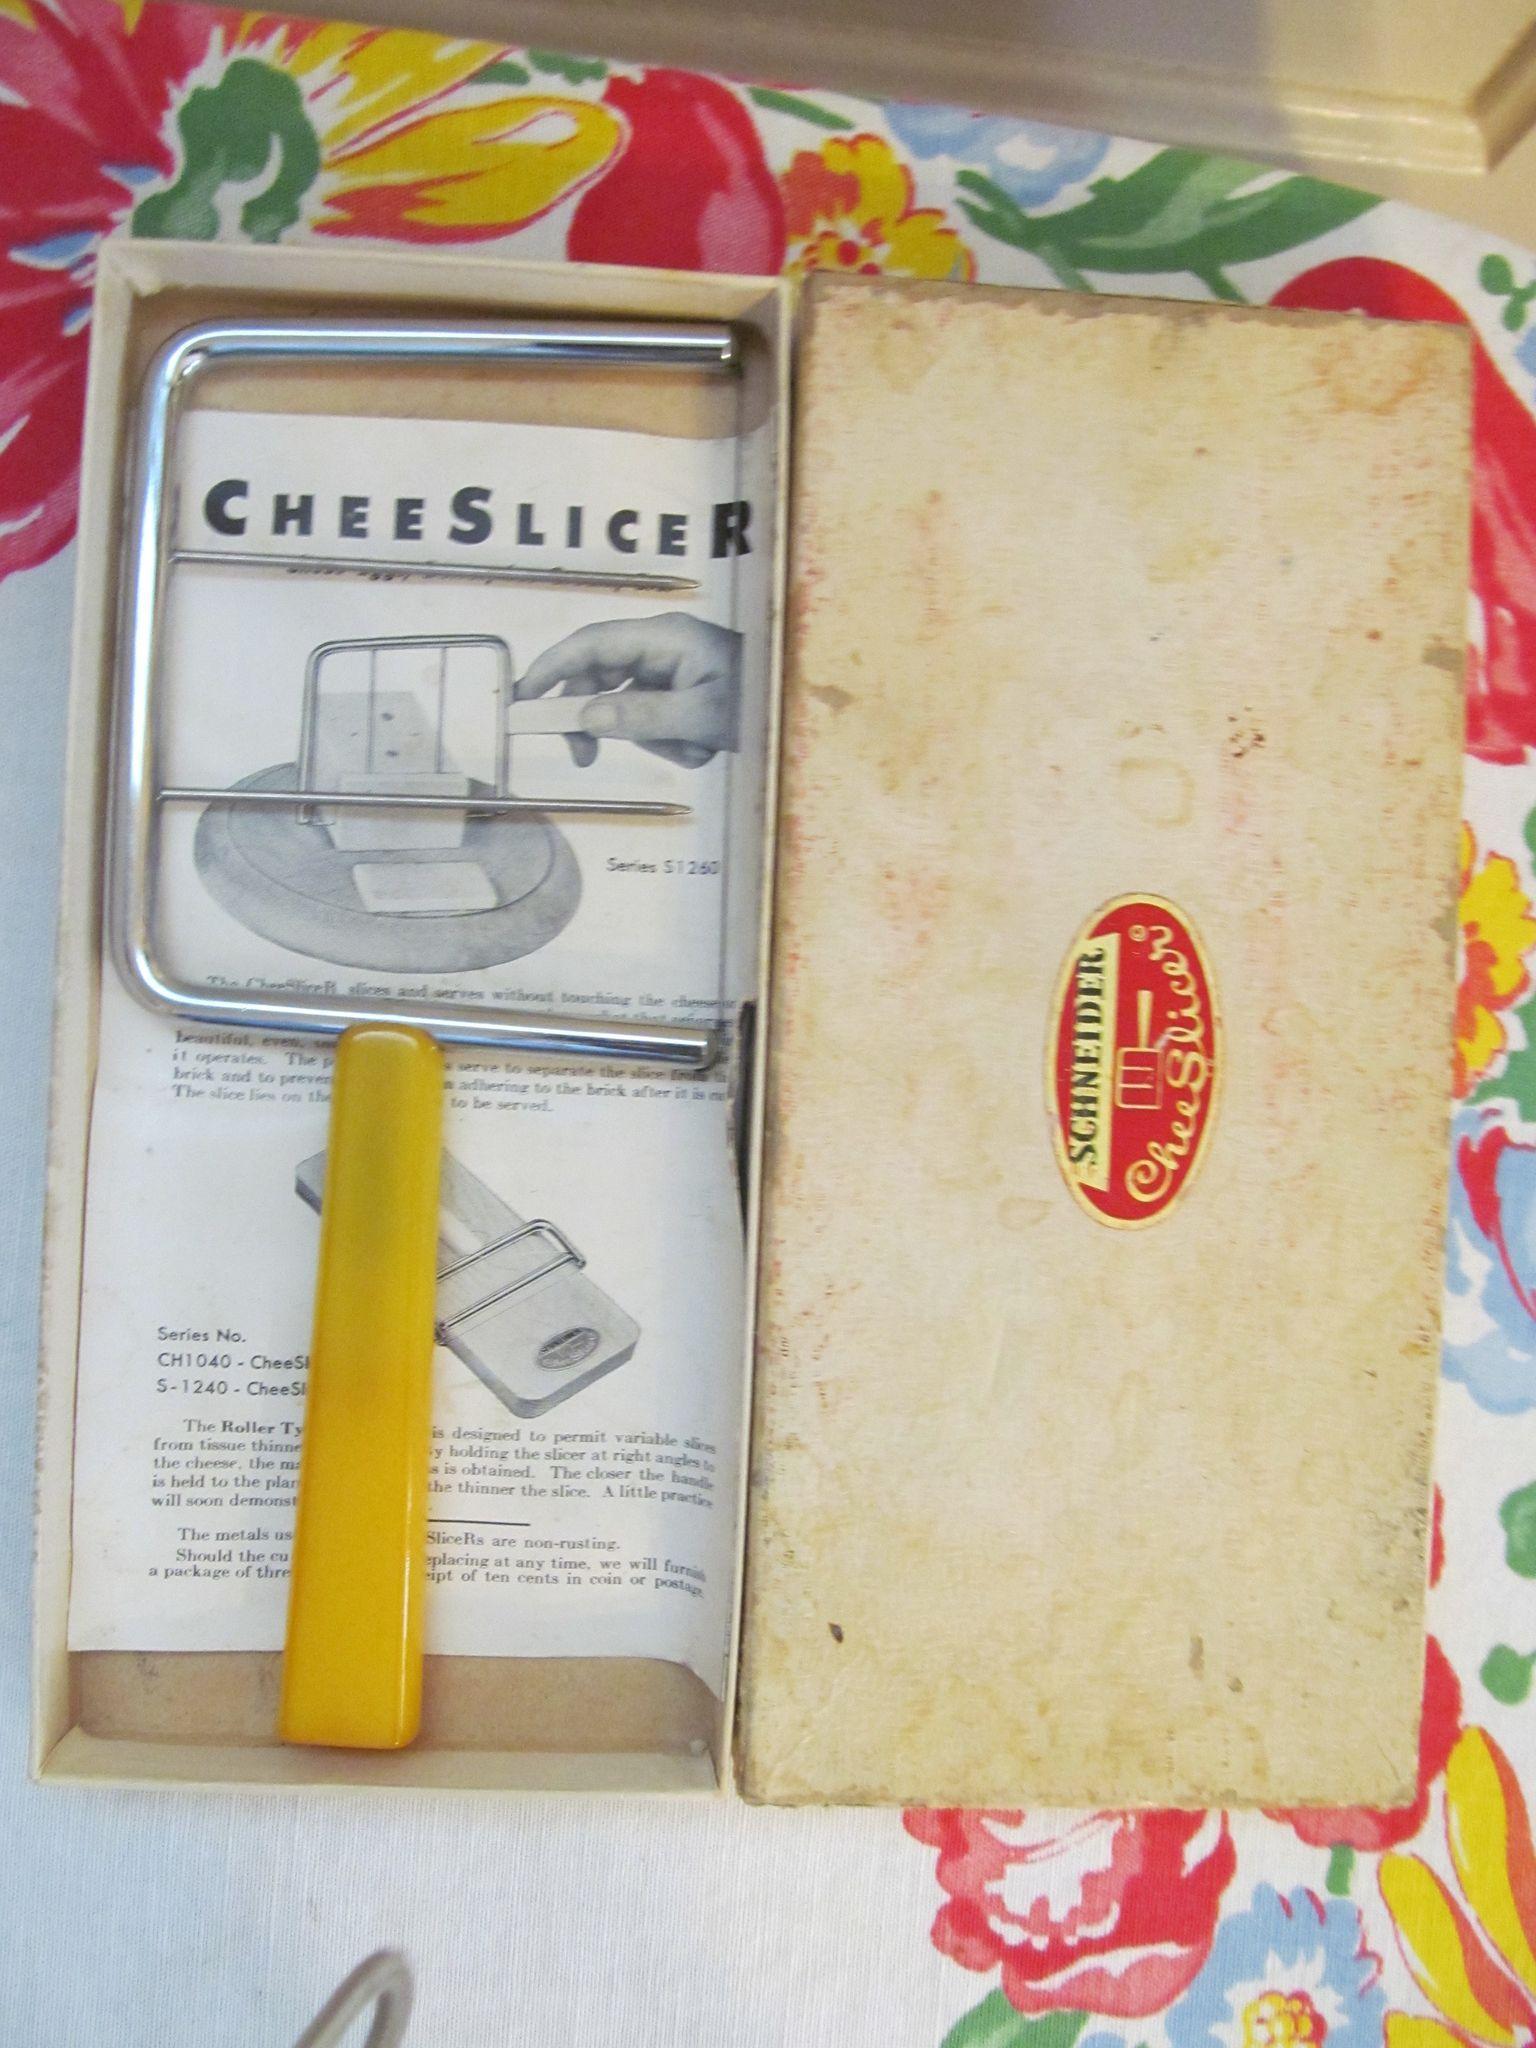 Yellow Bakelite Schmeider Cheese, Egg, Butter Slicer with brochure & Box